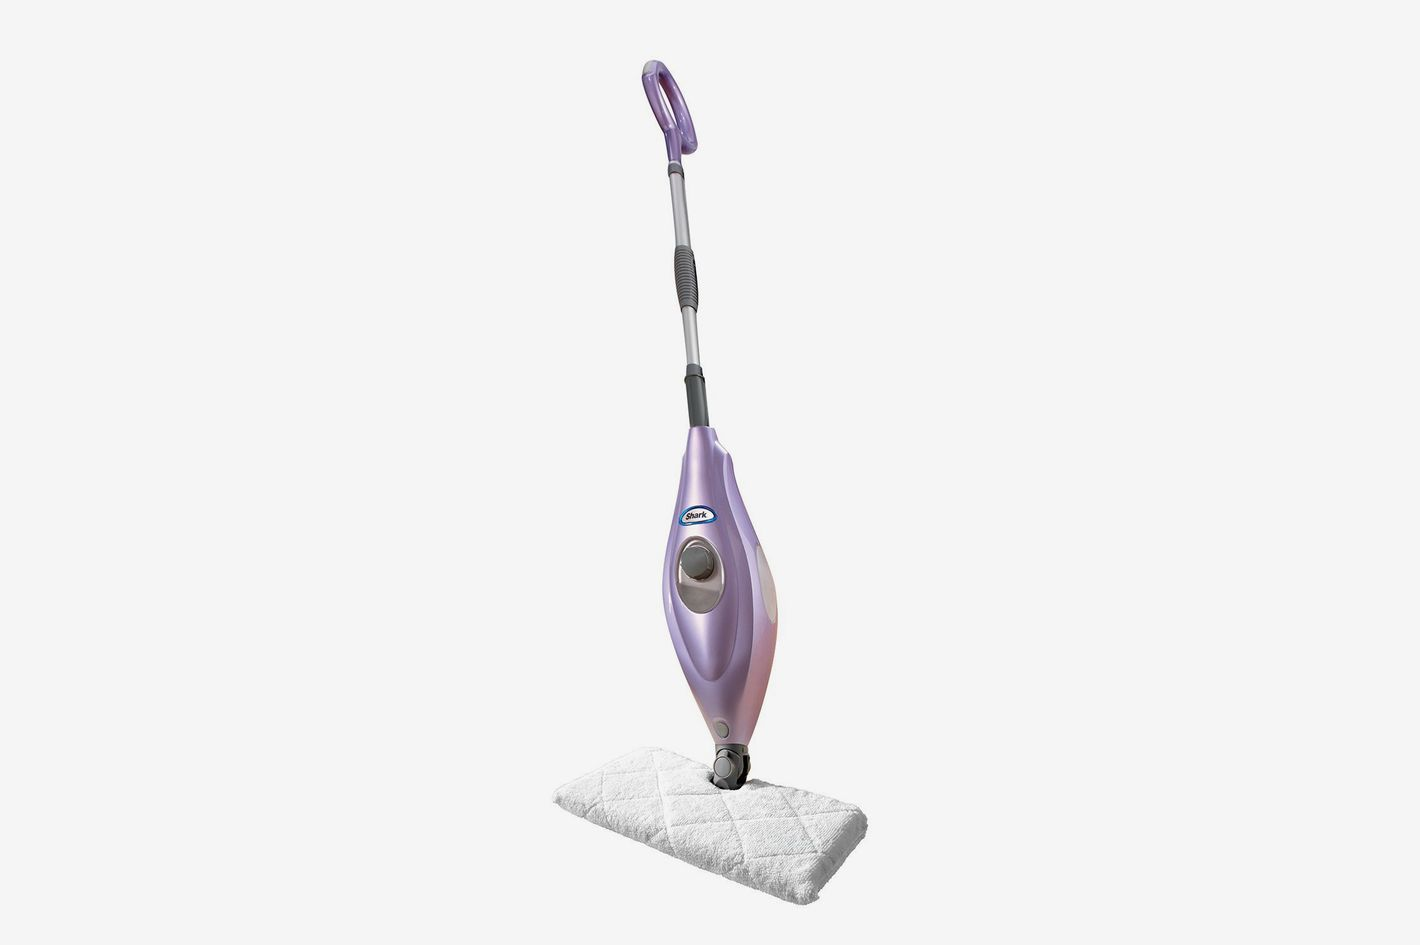 Shark Steam Pocket Mop Hard Floor Cleaner with Swivel Steering XL Water Tank